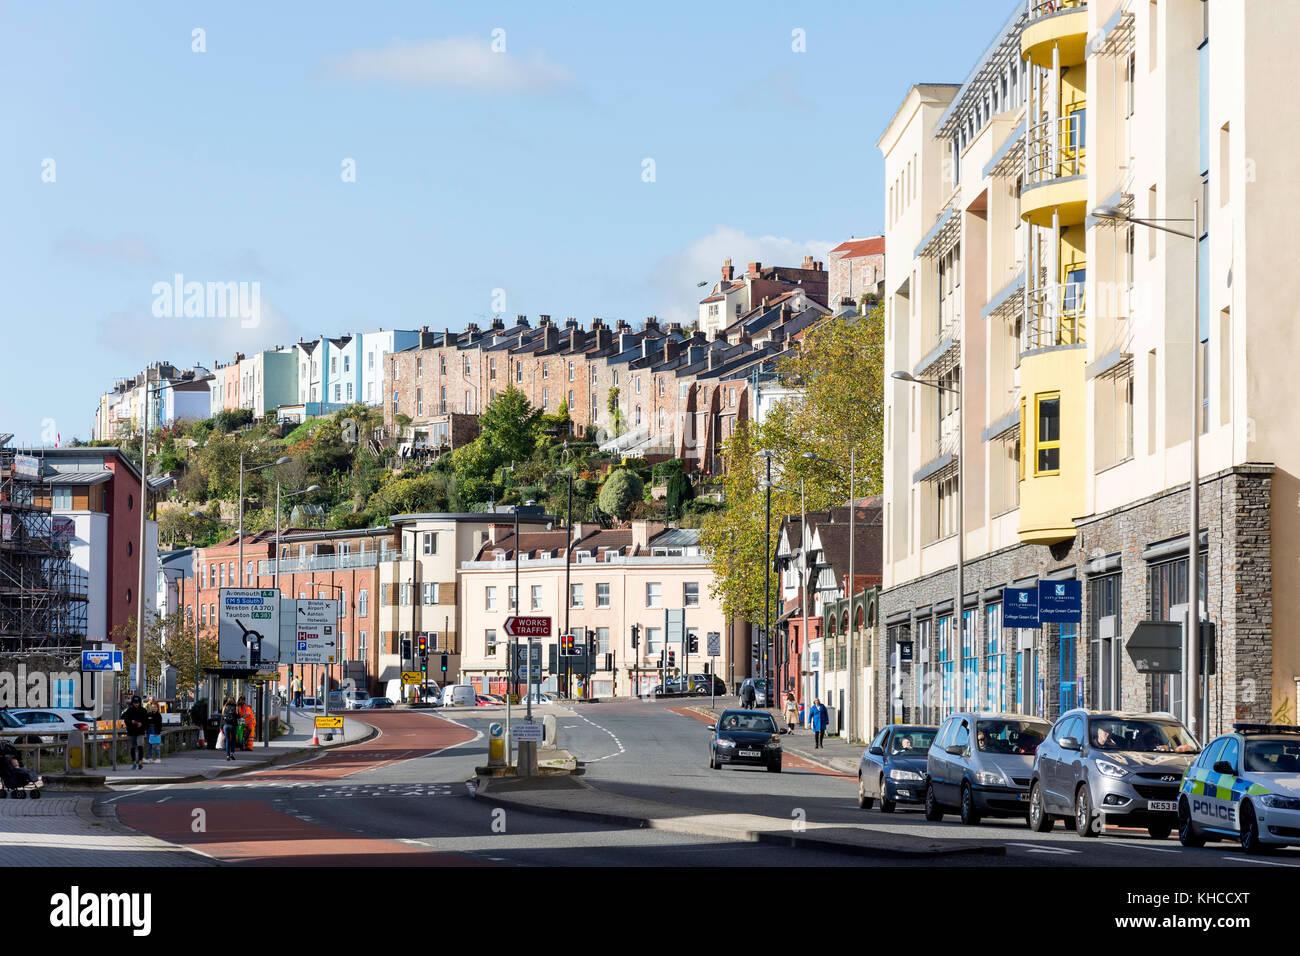 Anchor Road, Harbourside, Bristol, England, United Kingdom - Stock Image